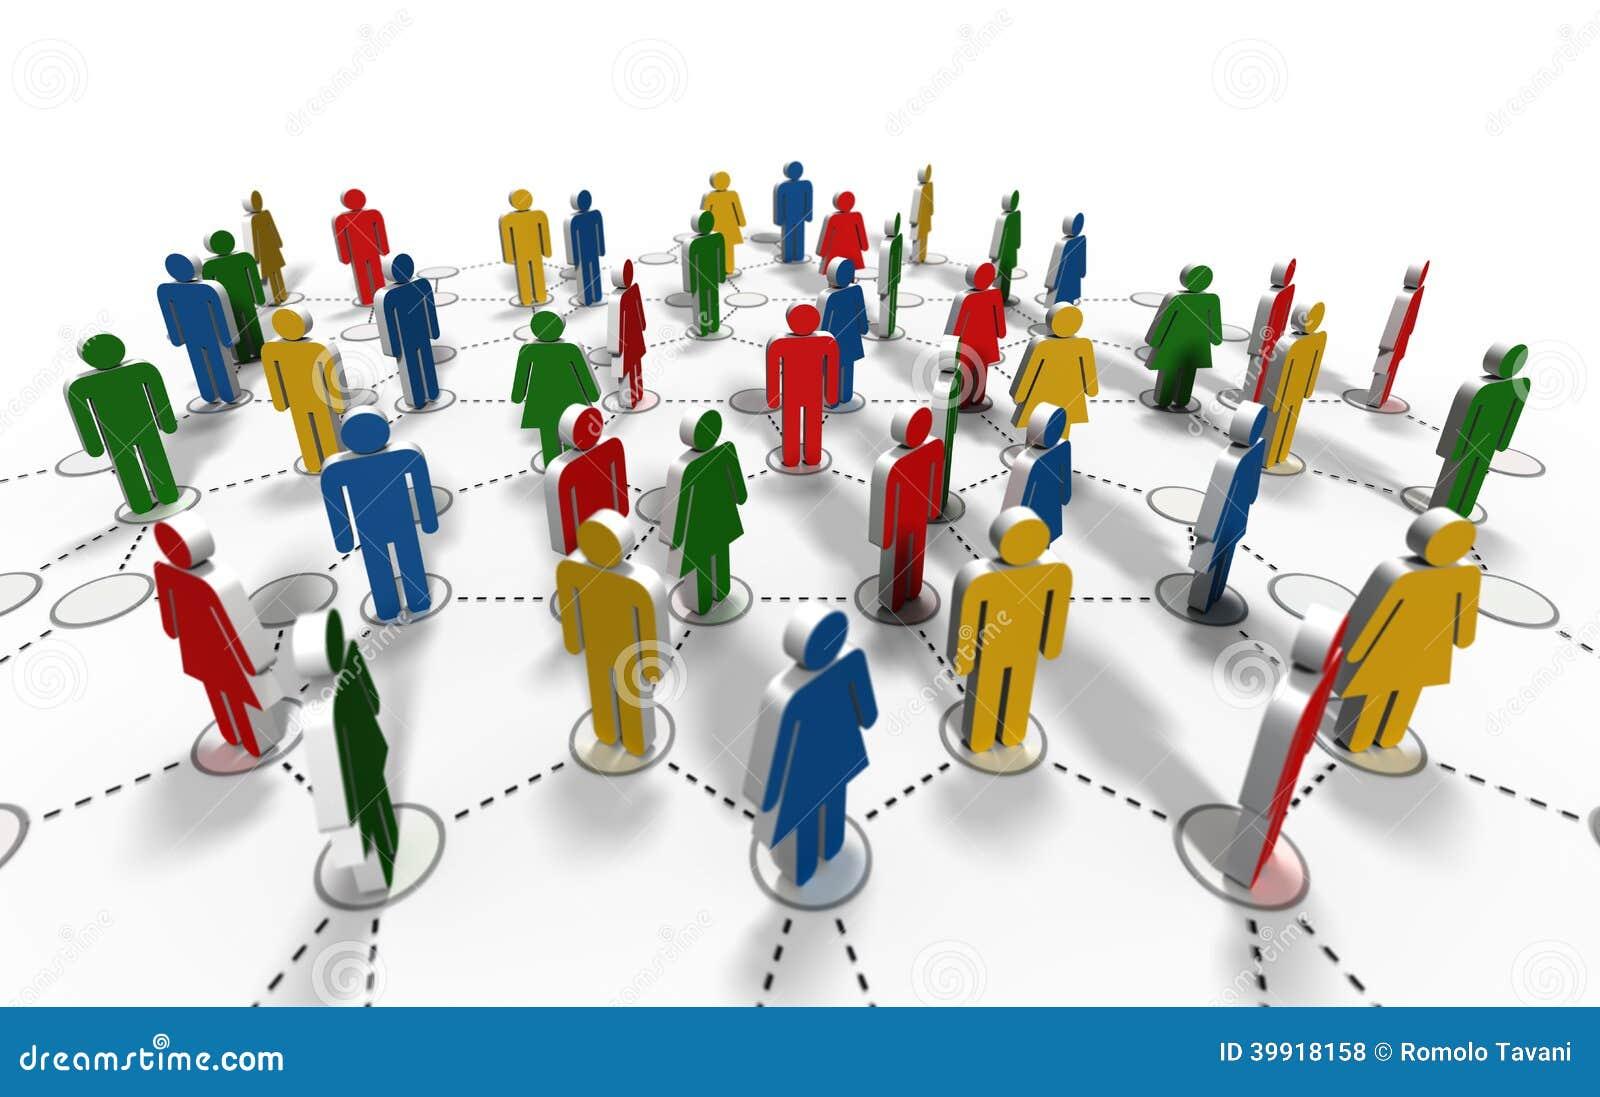 Network Community Stock Illustration - Image: 39918158